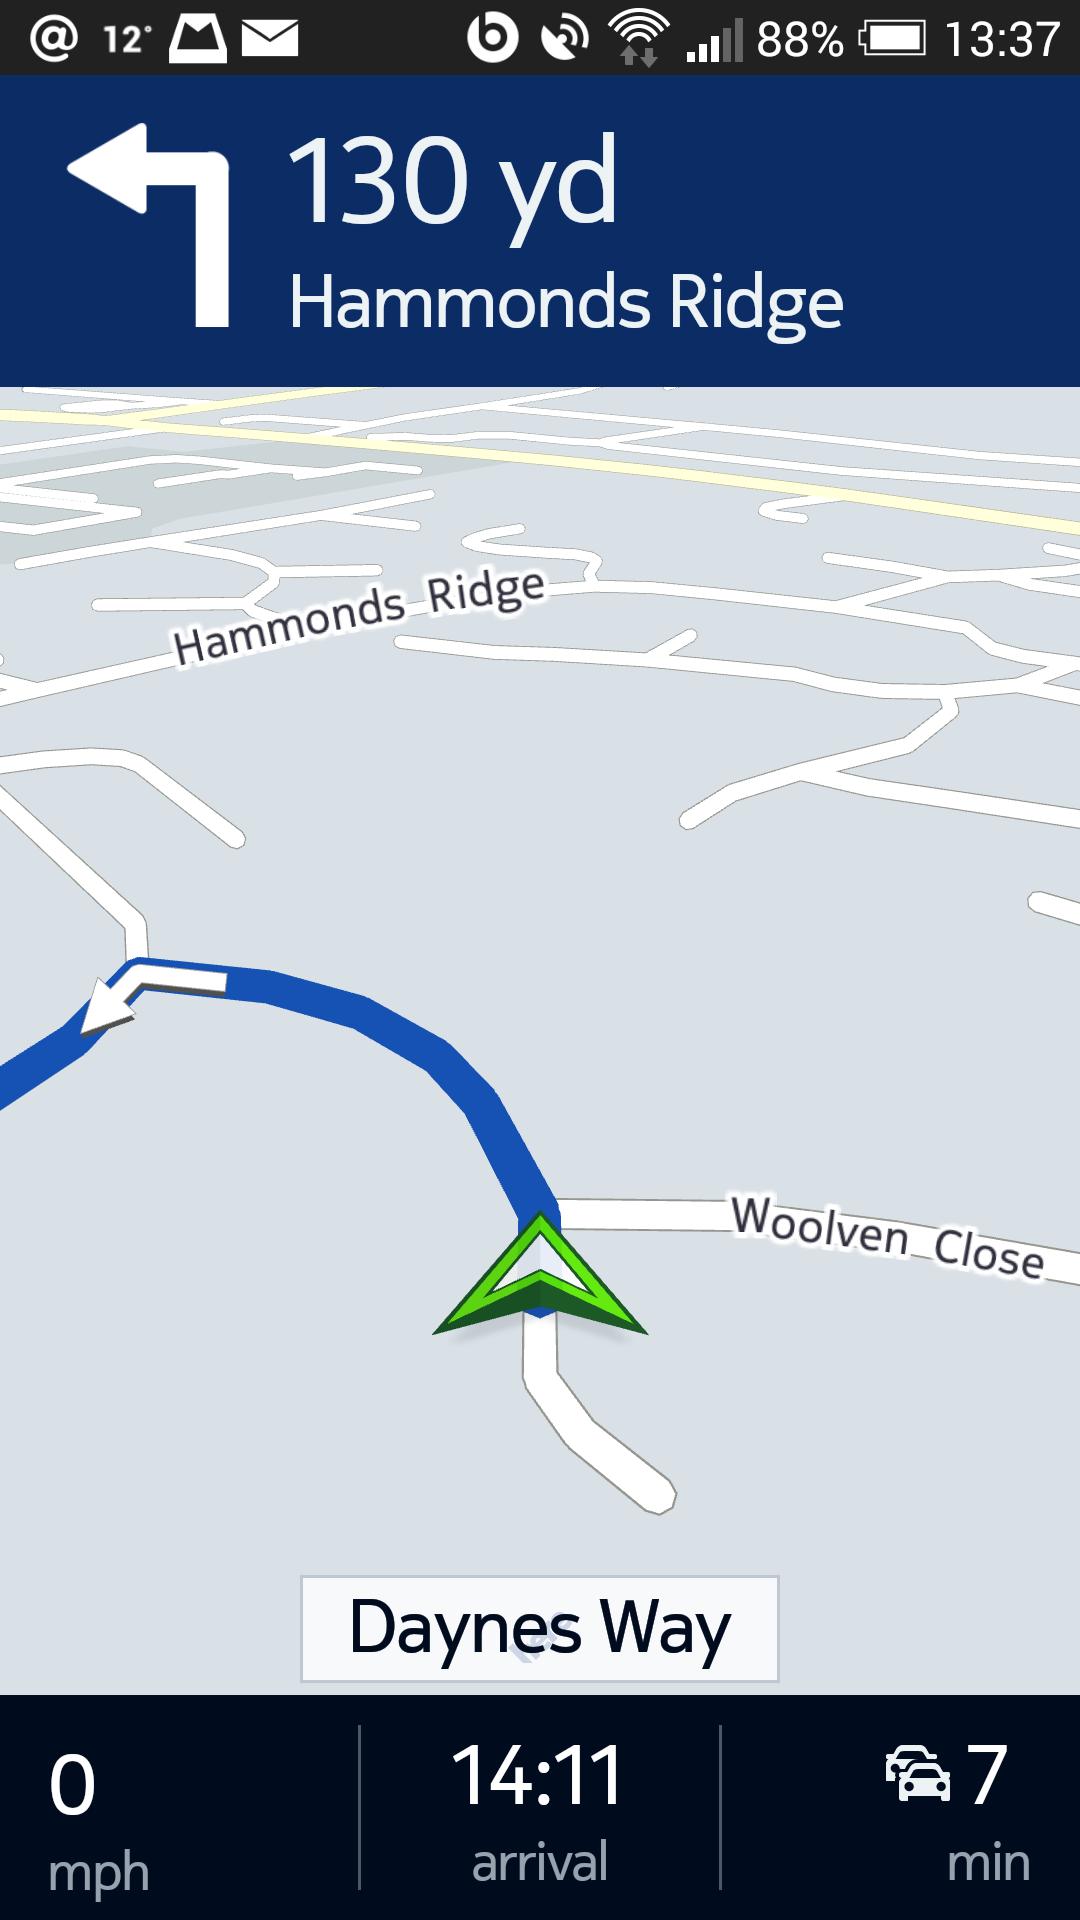 Google Maps Vs Nokia Here Vs Waze The Best Free Satnav Expert - Is google maps app free